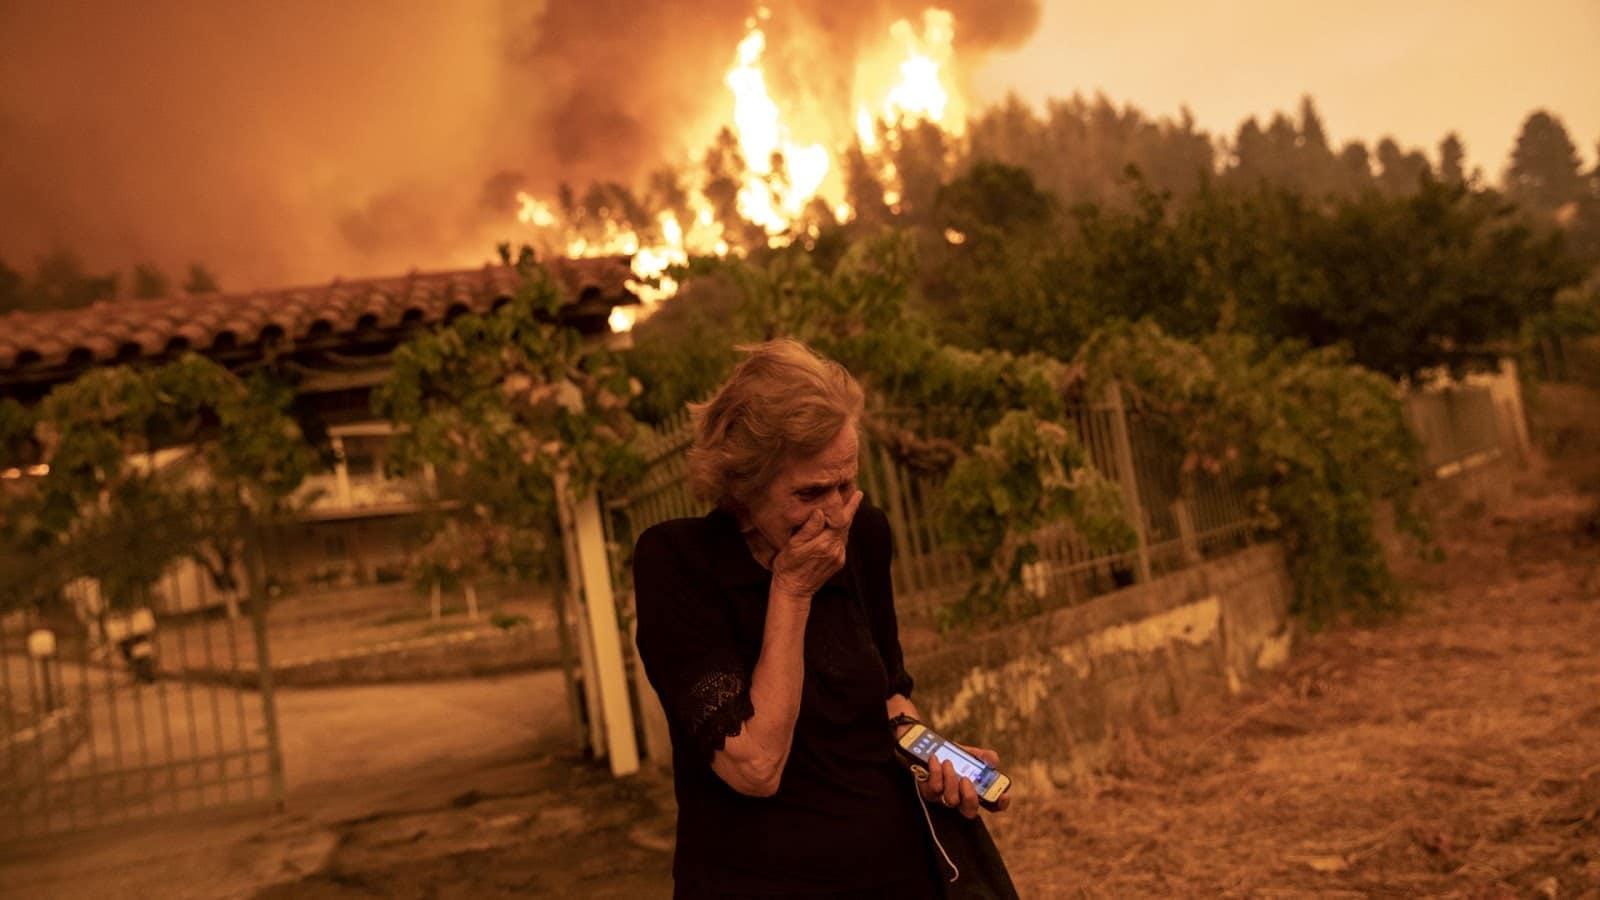 IPCC, Intergovernmental Panel on Climate Change